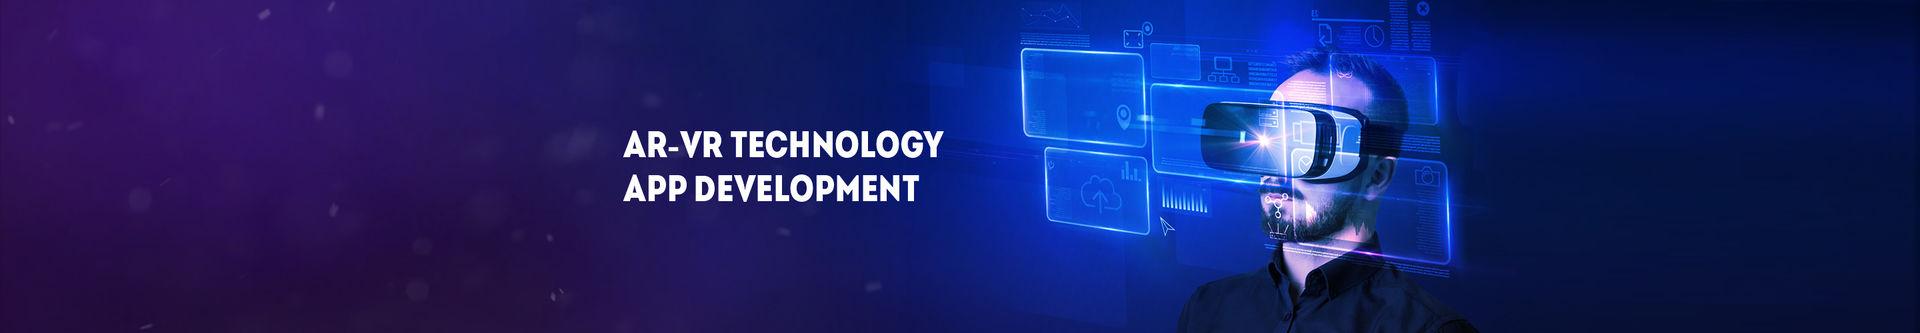 AR/VR Technology App Development Services | Consagous Technologies